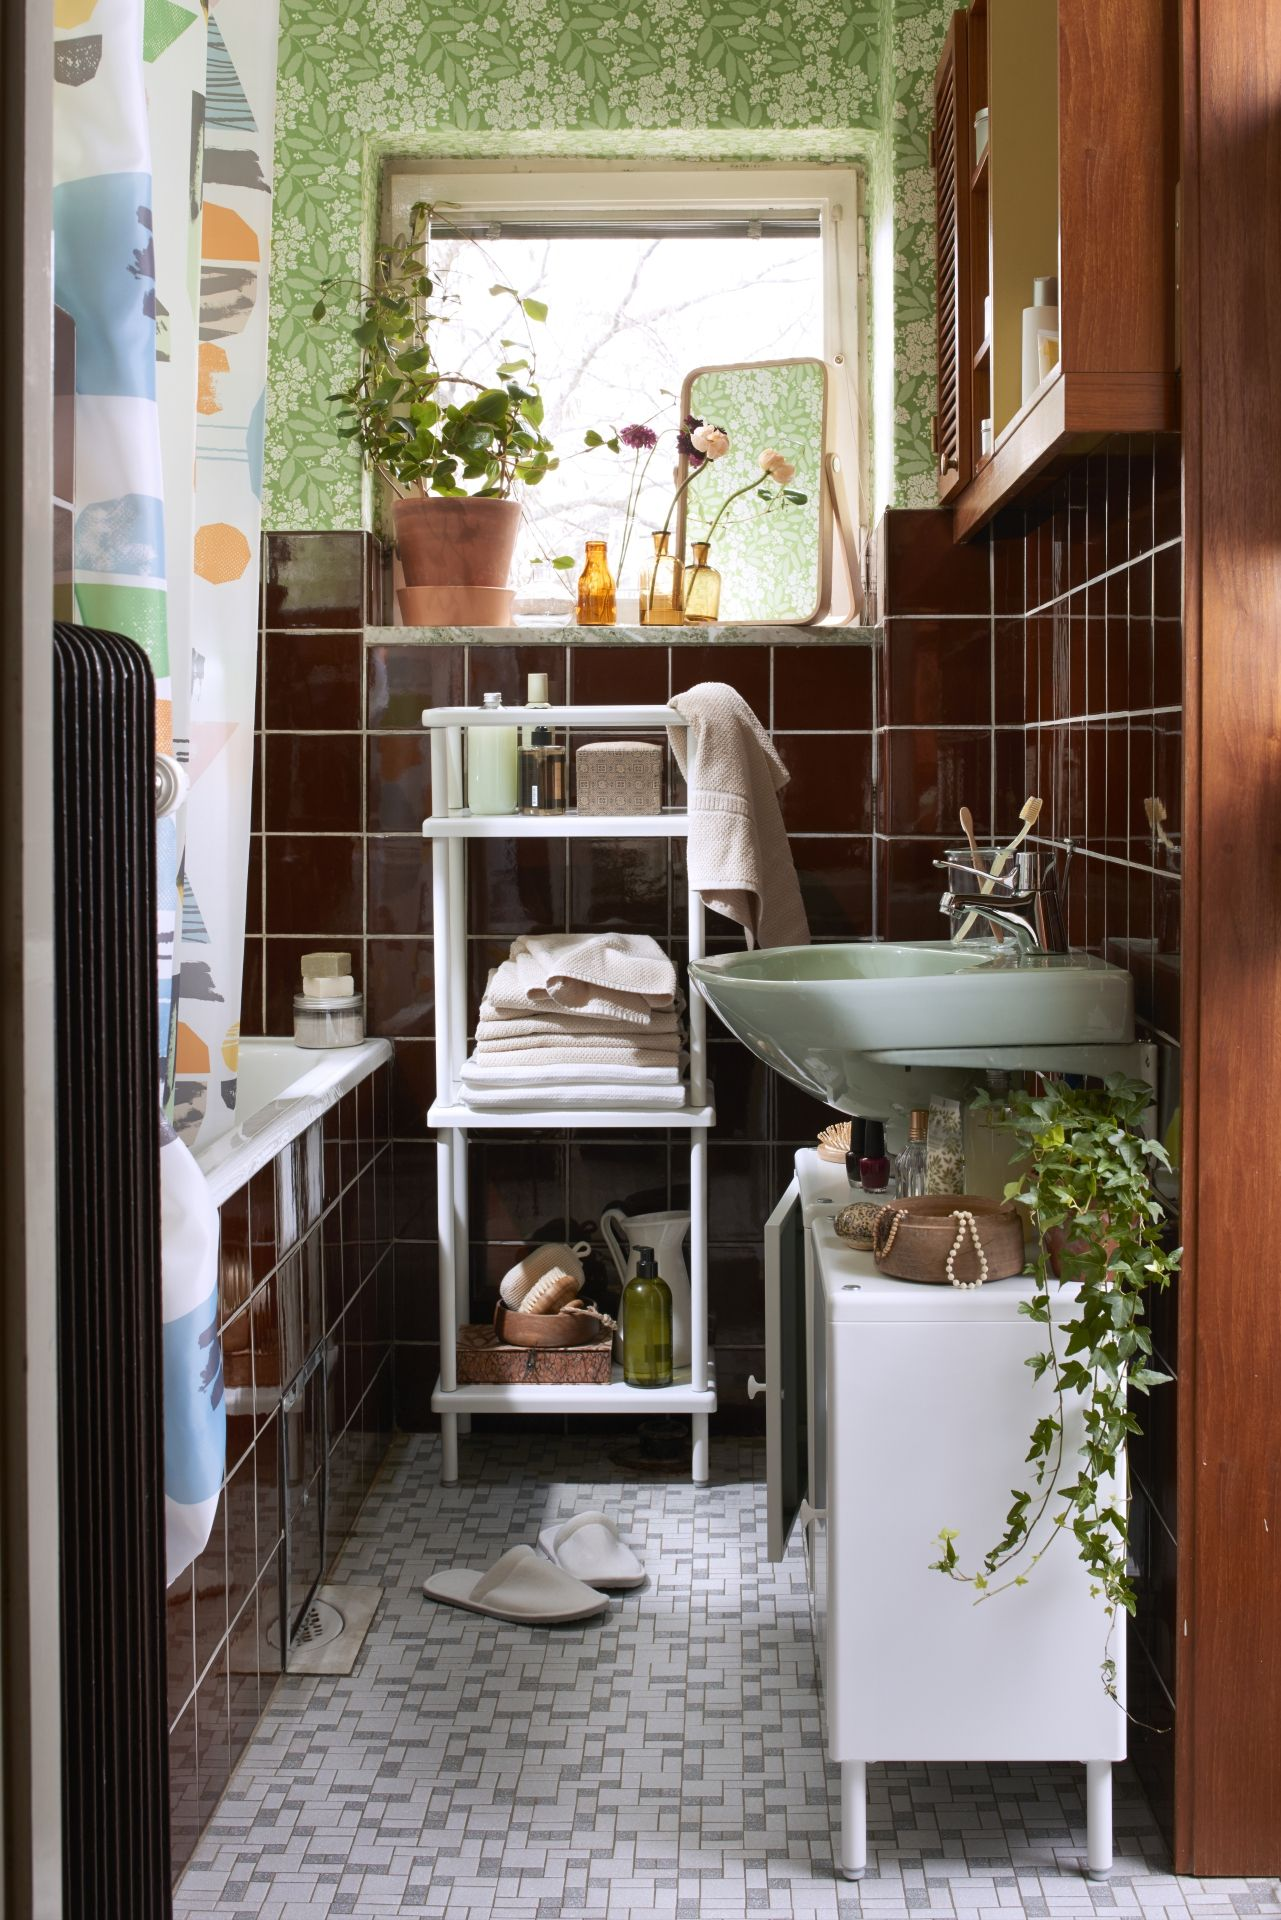 DYNAN Rek met handdoekstang, wit | Paris apartments, Interiors and ...